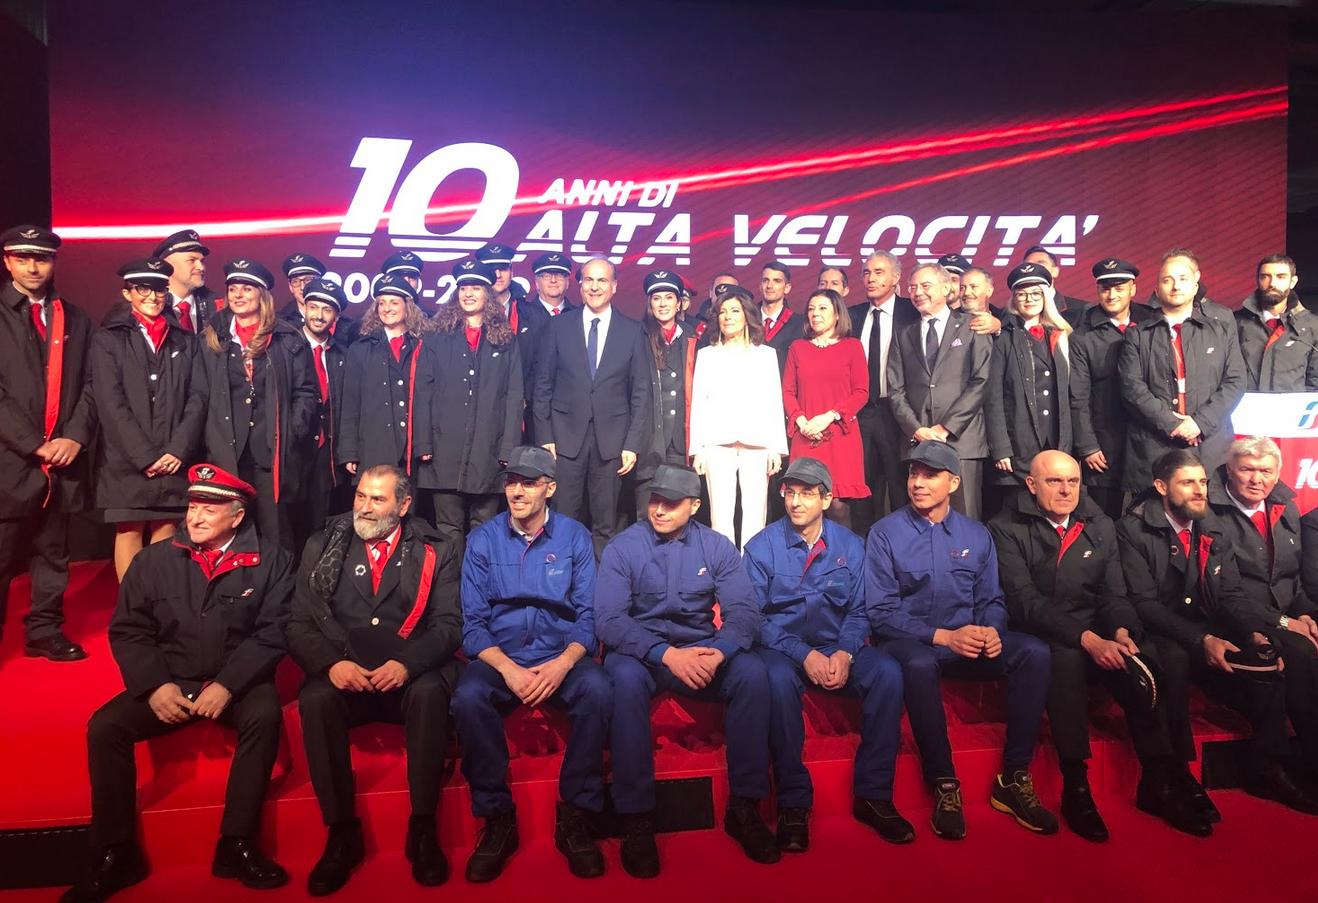 Alta velocità, Gruppo Fs festeggia i 10 anni